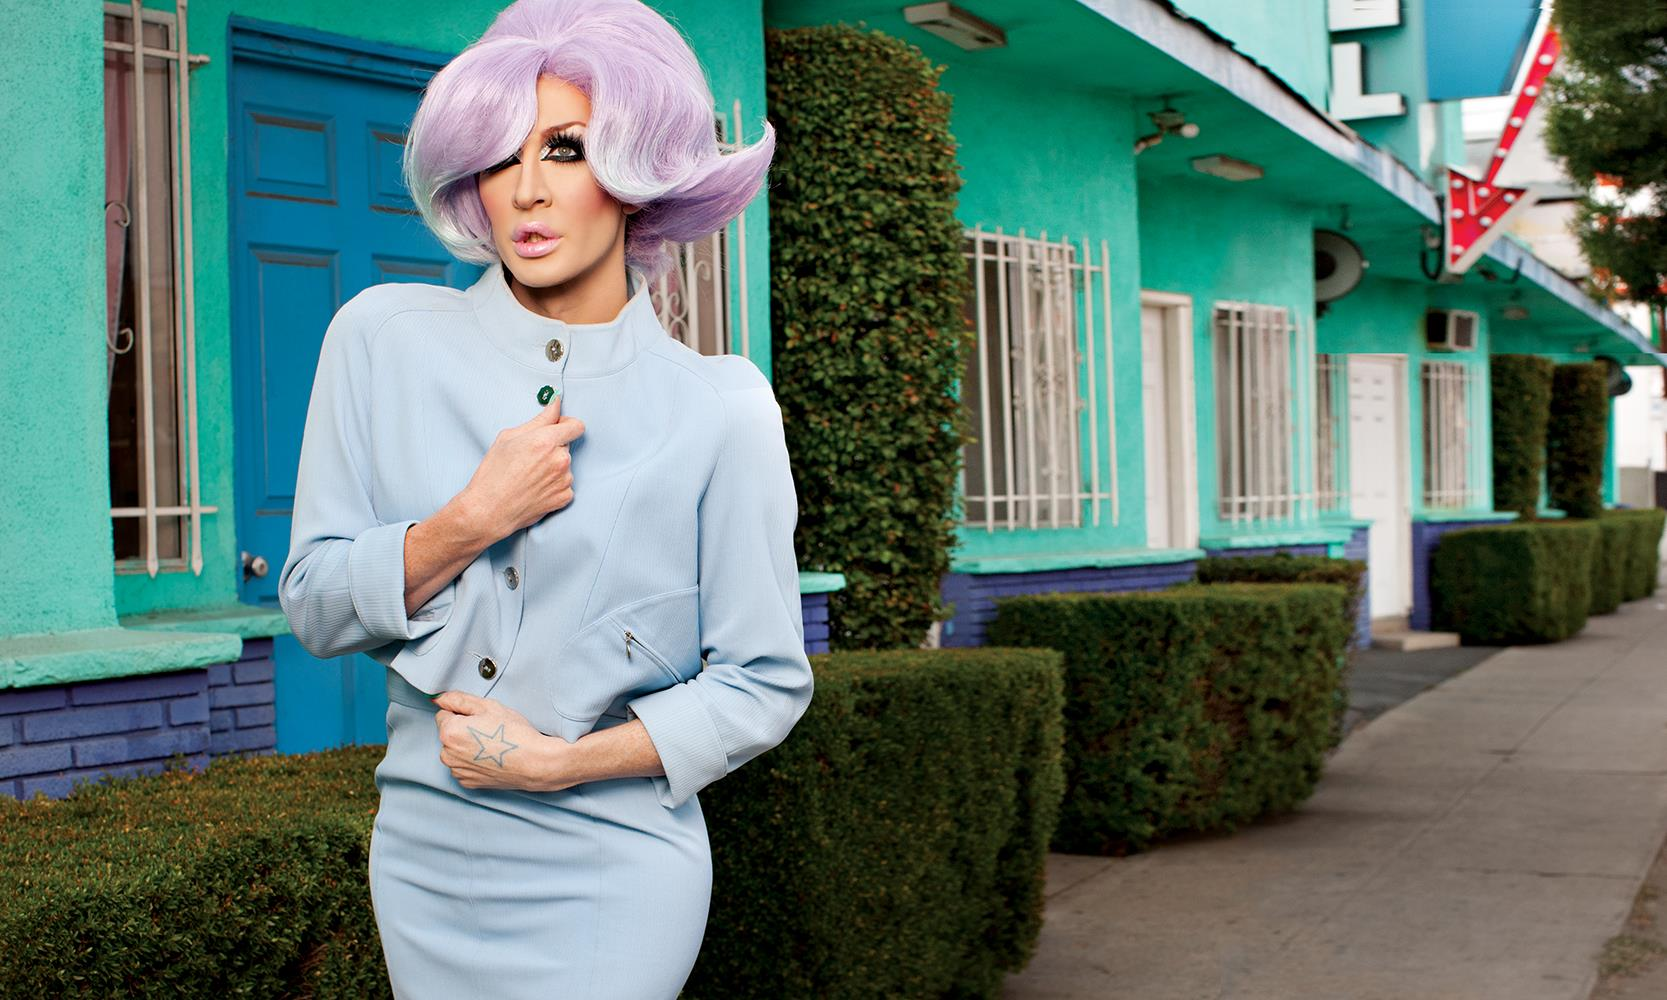 detox drag queen magnus hastings